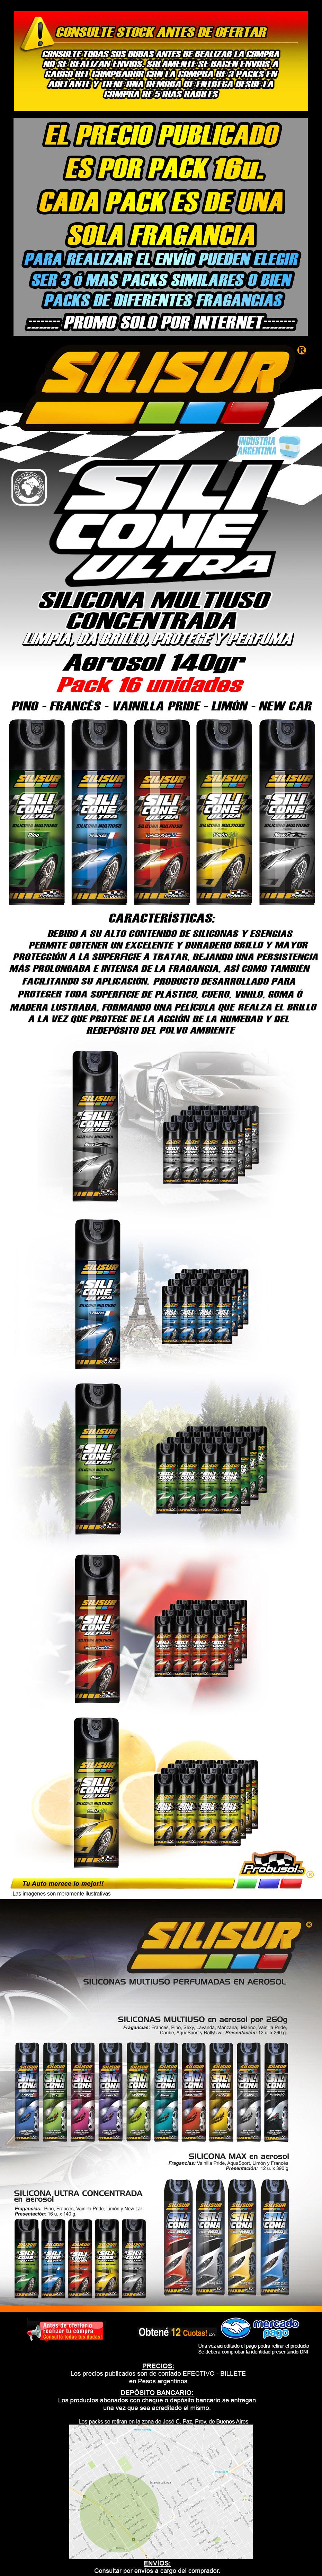 silisur silicona multiuso ultra concentrada aerosol 140grs pack 16u.